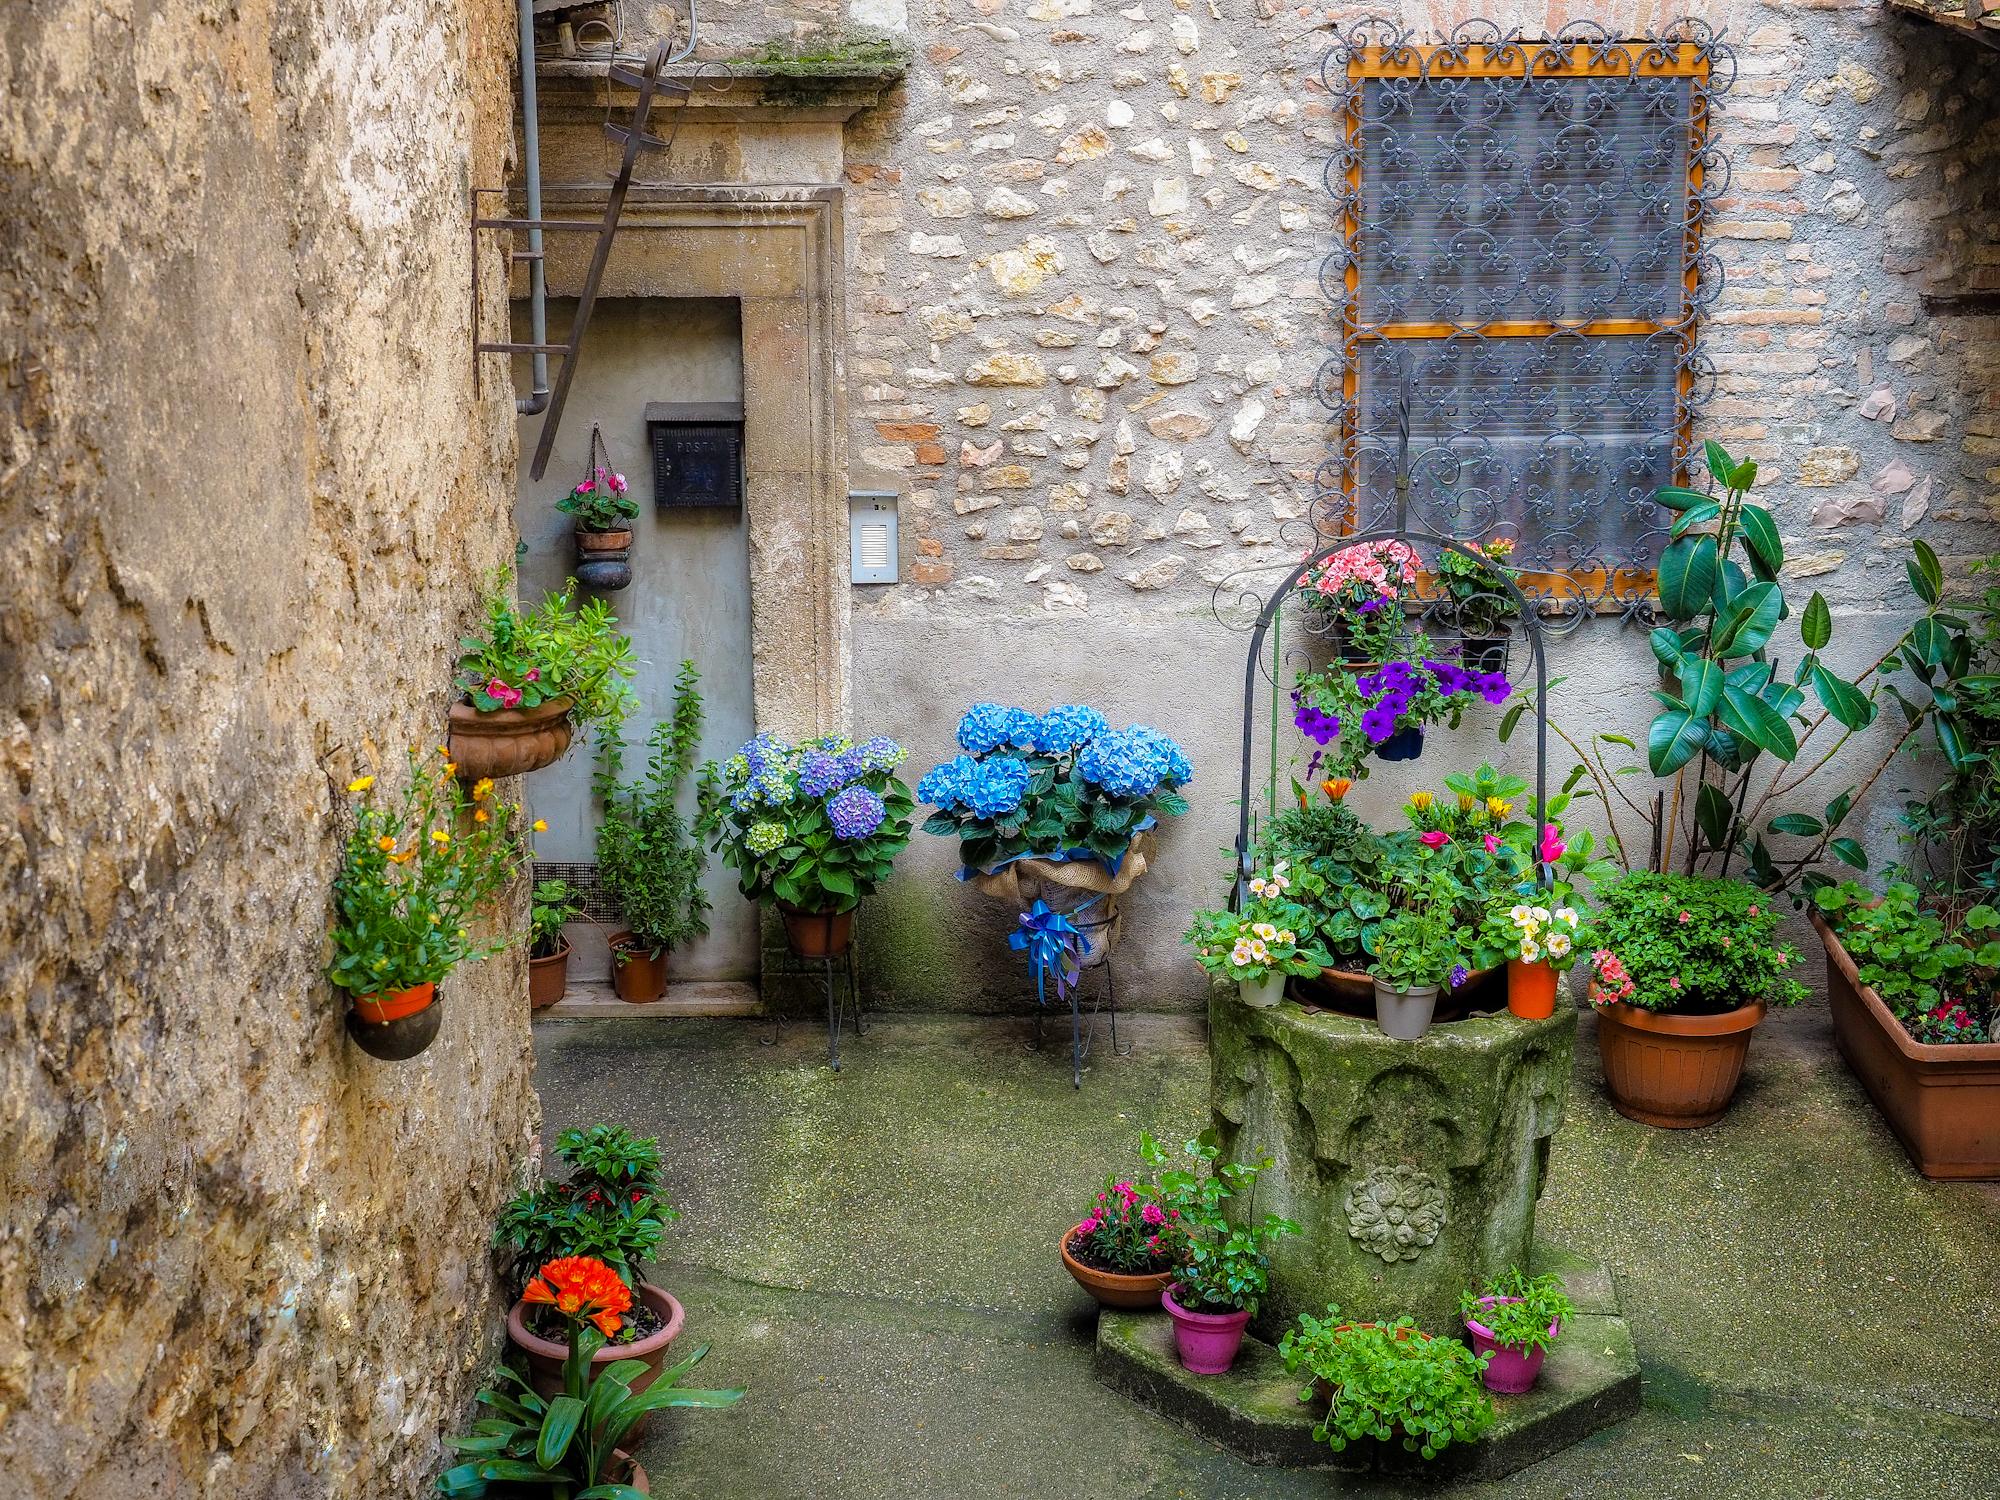 Between the alleys of Narni ...